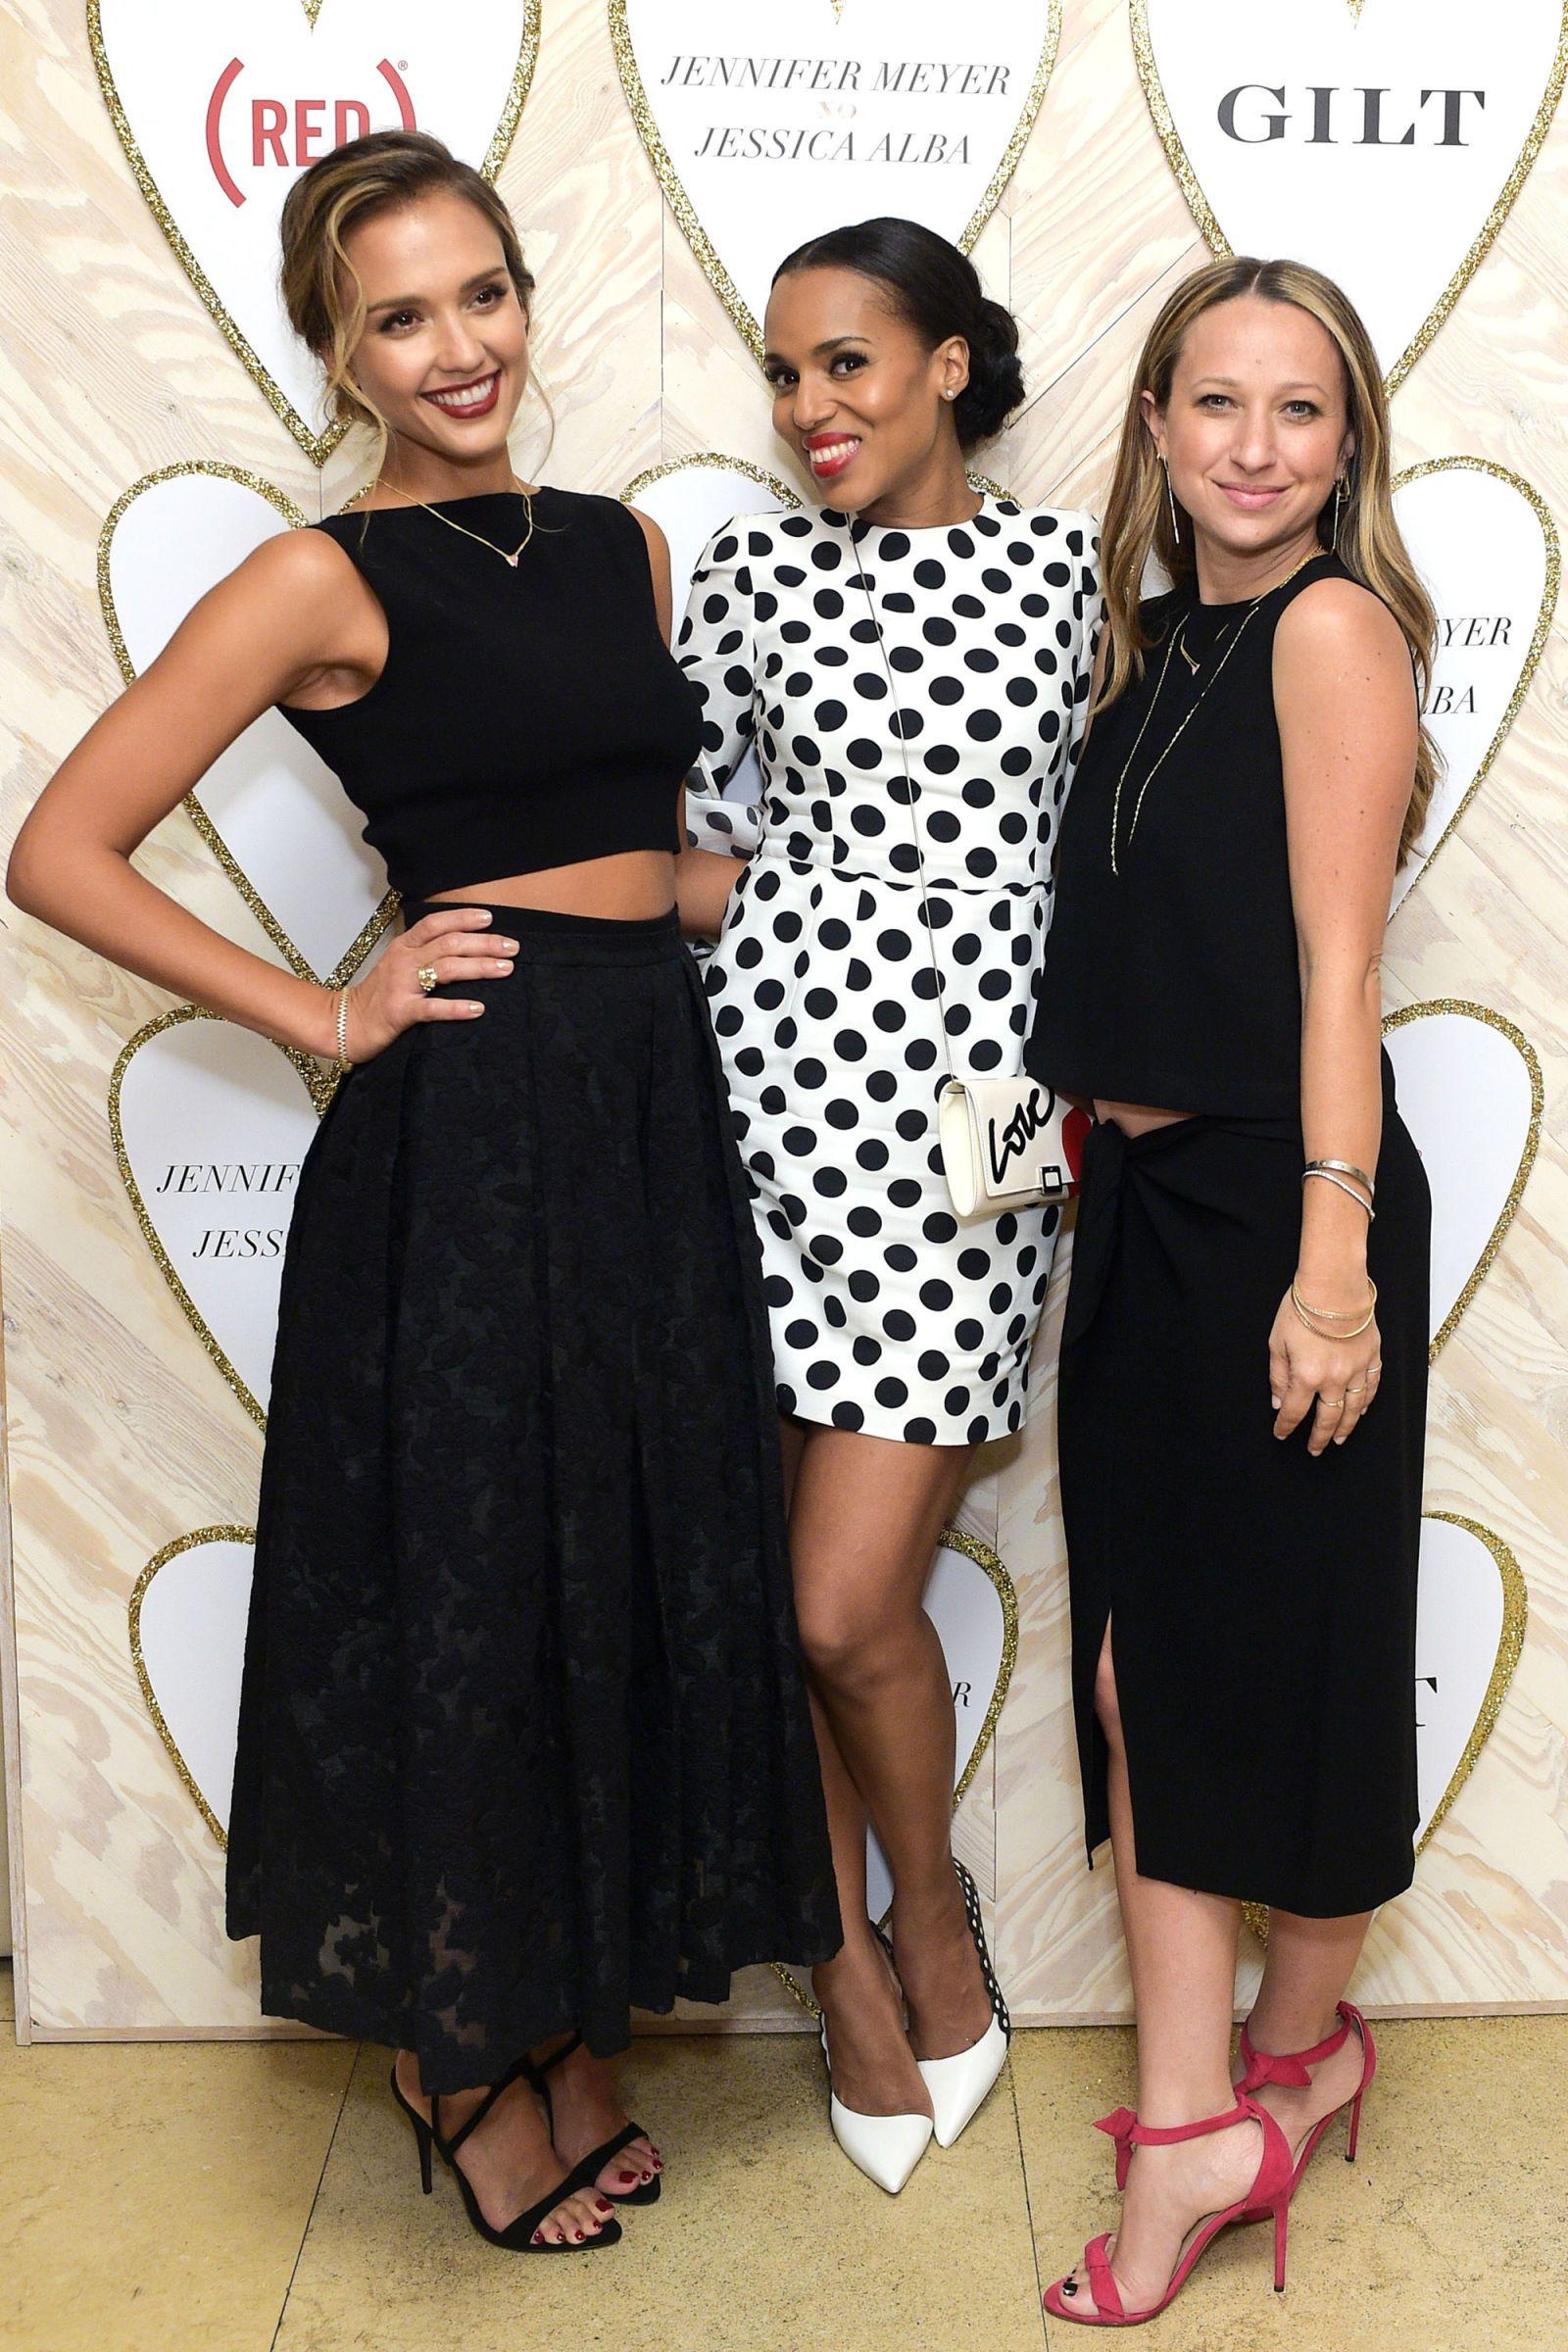 Jennifer Meyer And Jessica Alba Fte Their New Jewelry Collab Jolie Clothing Neil Polka Midi Dress